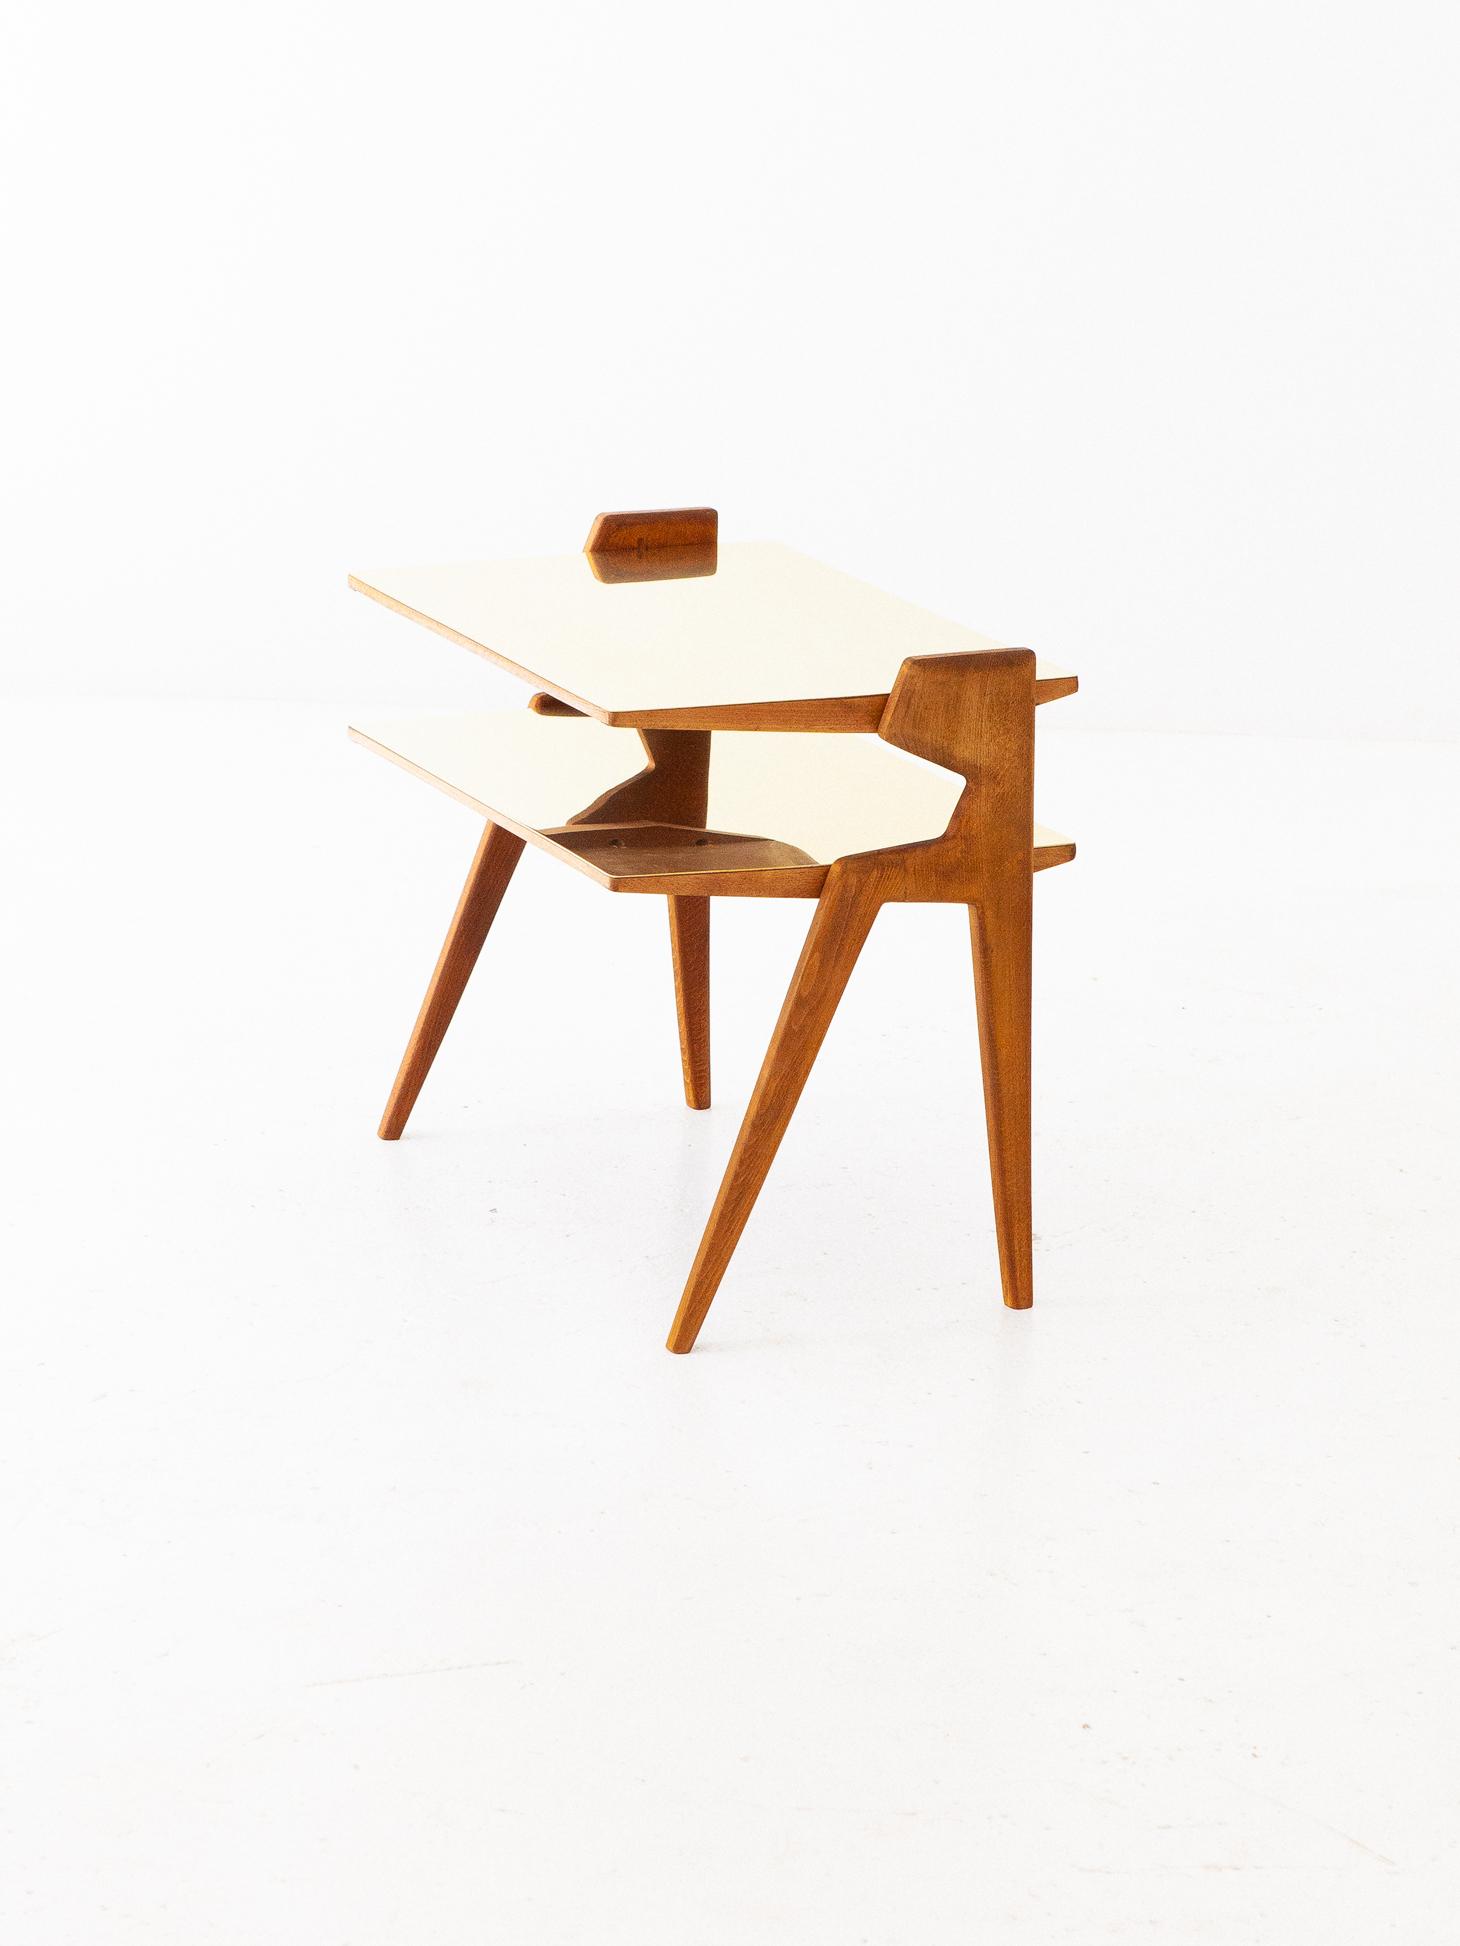 1950s-italian-brass-light-wood-two-levels-side-table-7-t81